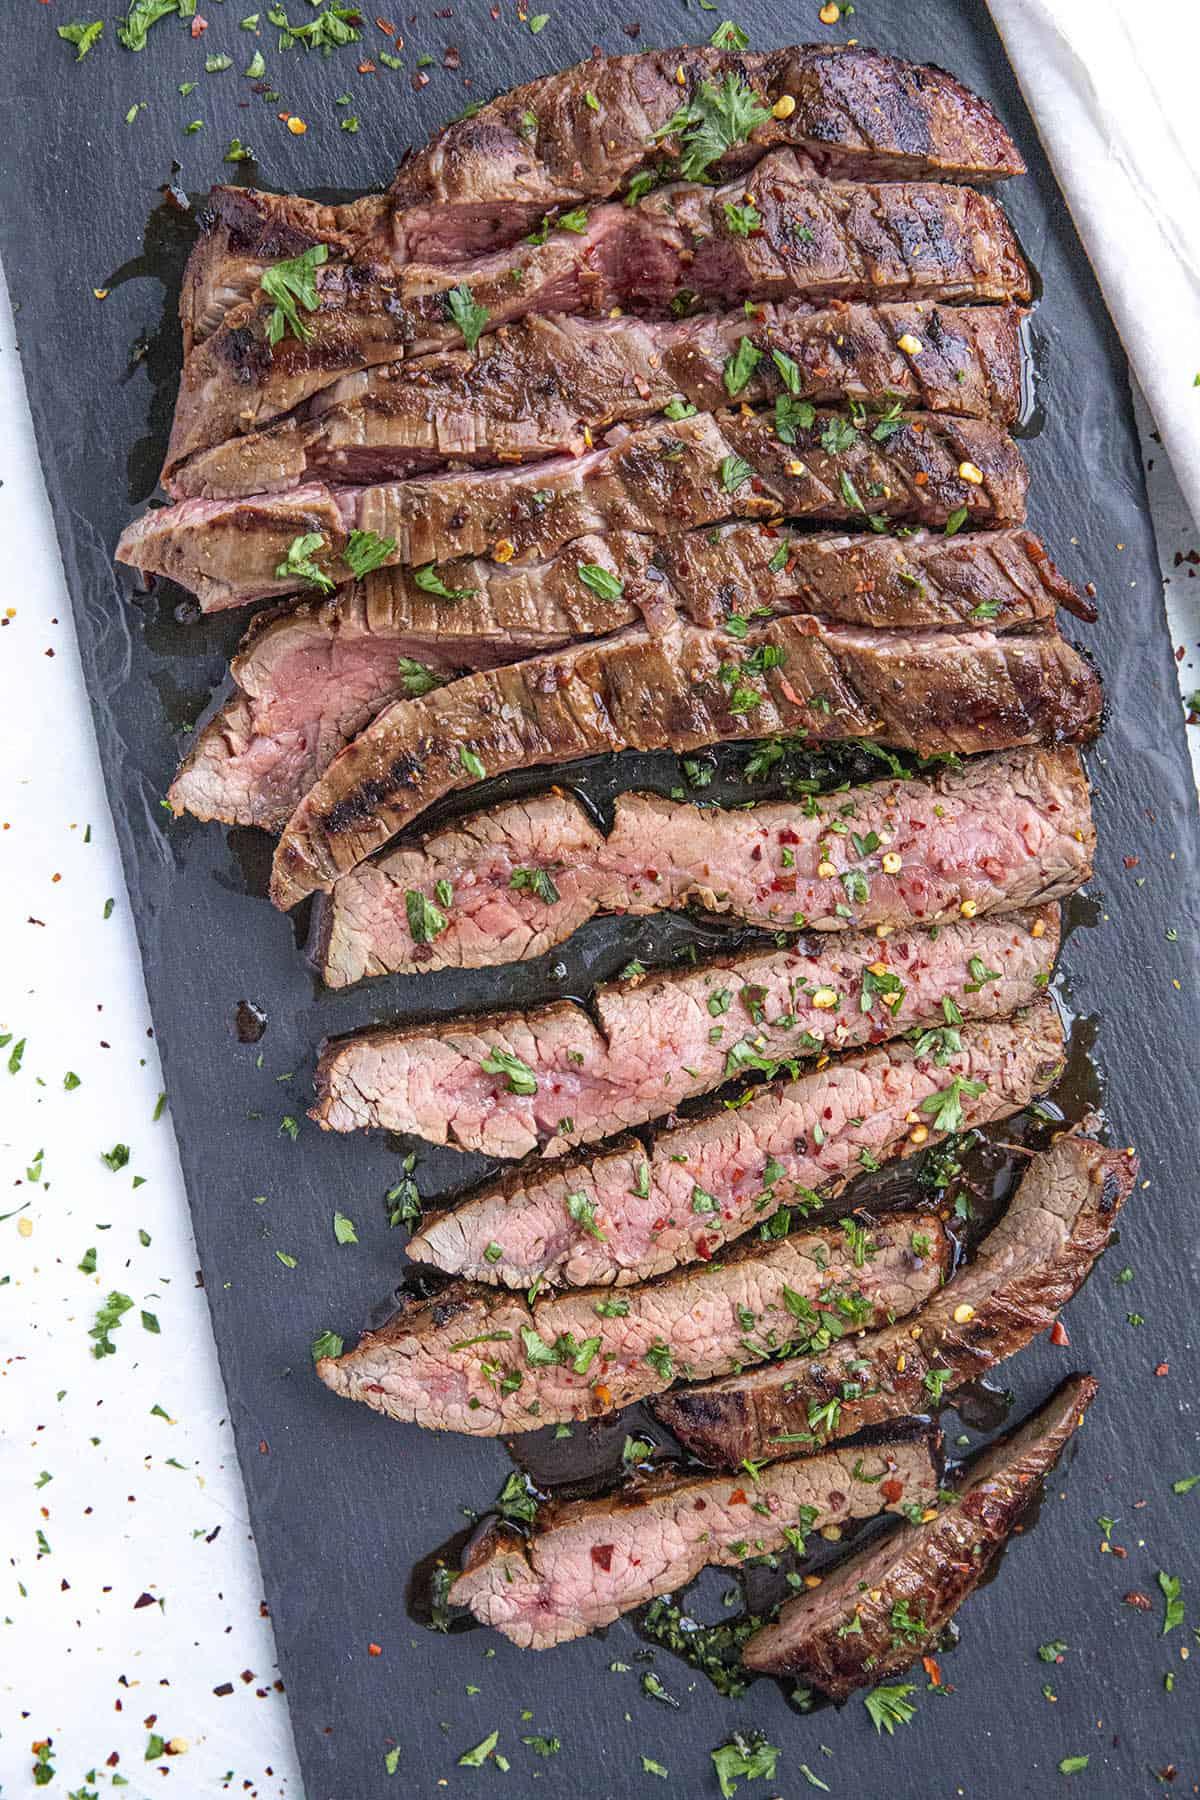 Sliced marinated flank steak ready to eat